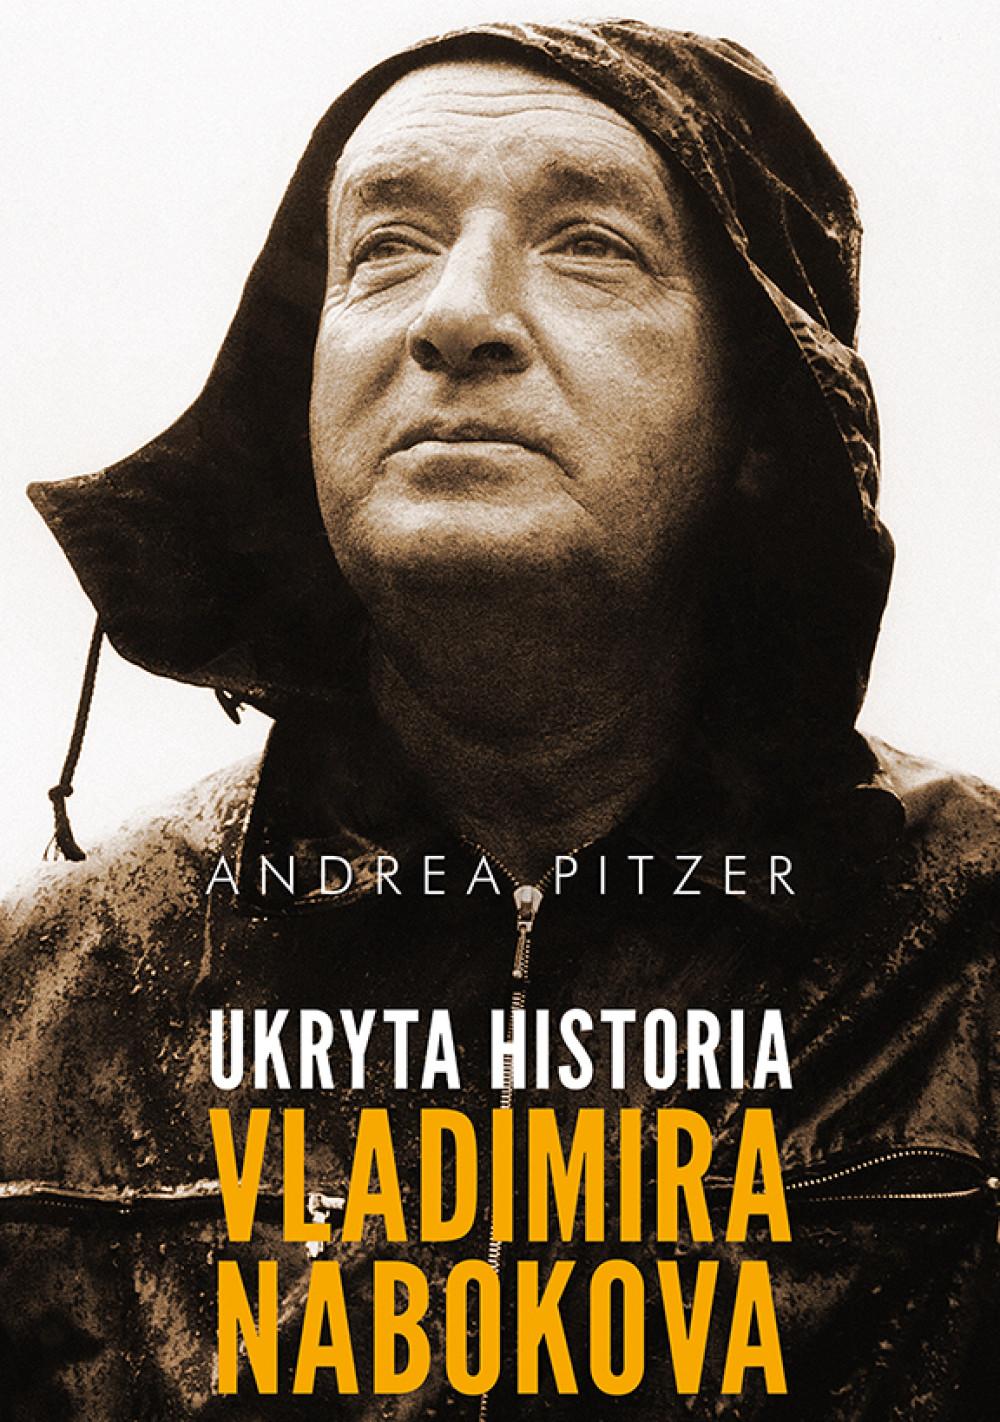 Ukryta historia Vladimira Nabokova ebook